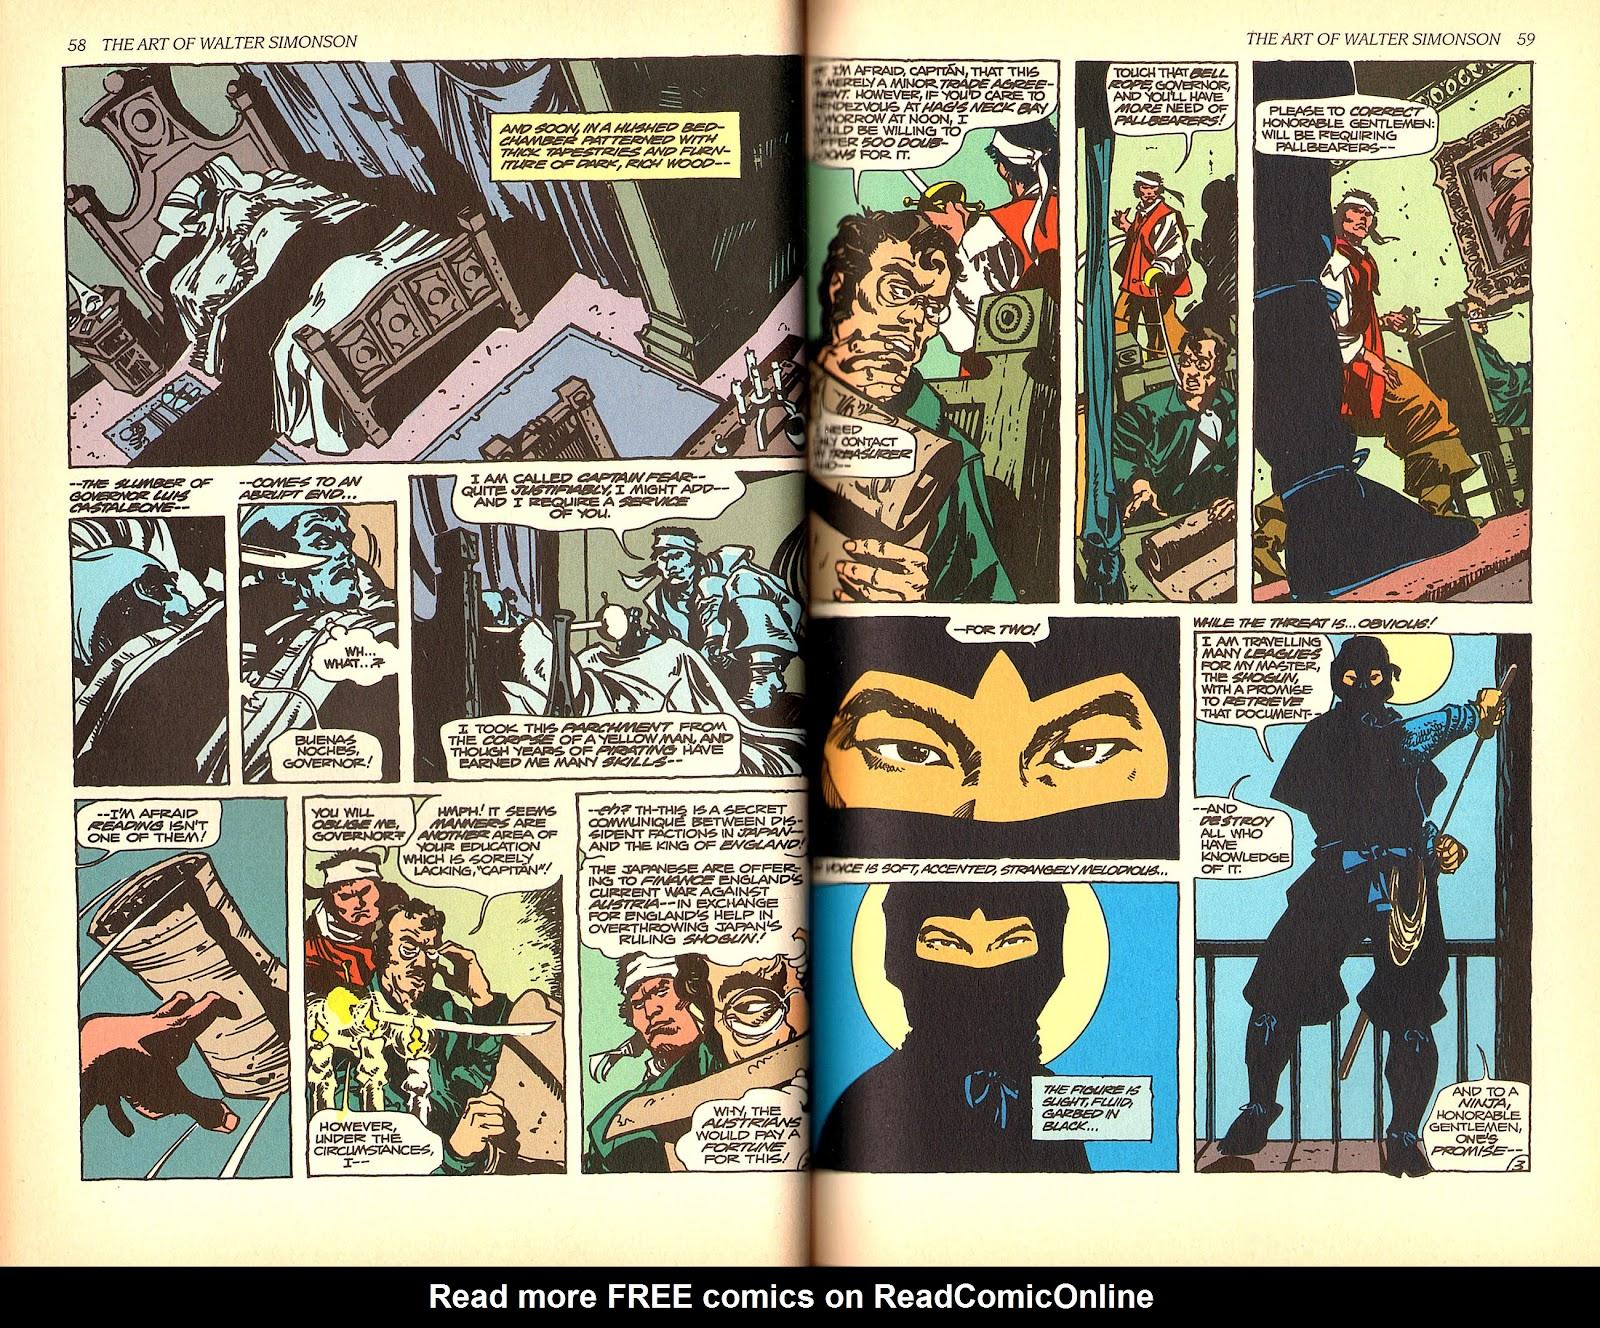 Read online The Art of Walter Simonson comic -  Issue # TPB - 31